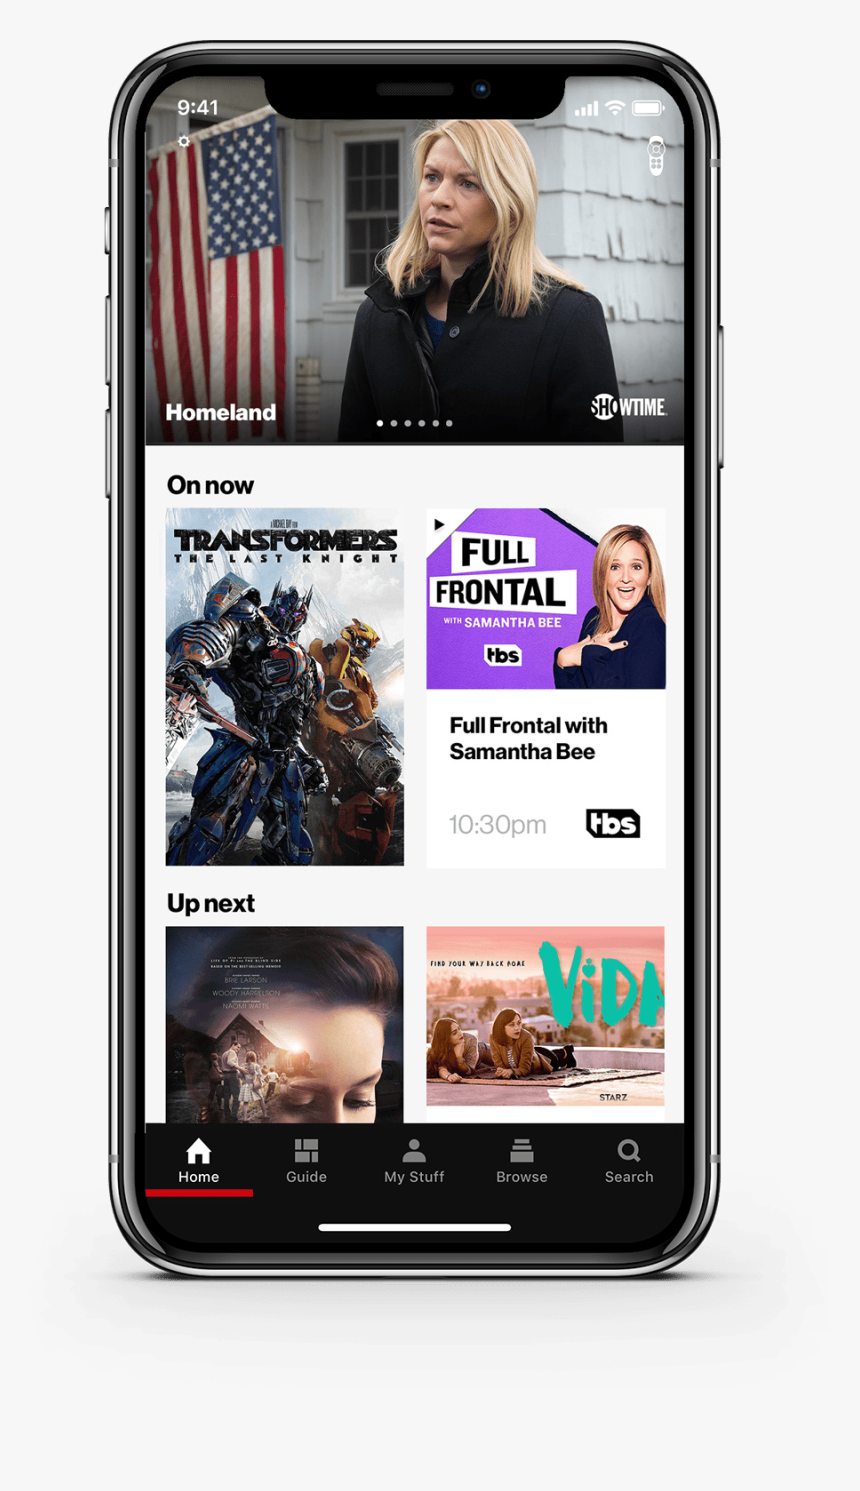 Smartphone Clipart , Png Download - Smartphone, Transparent Png, Free Download